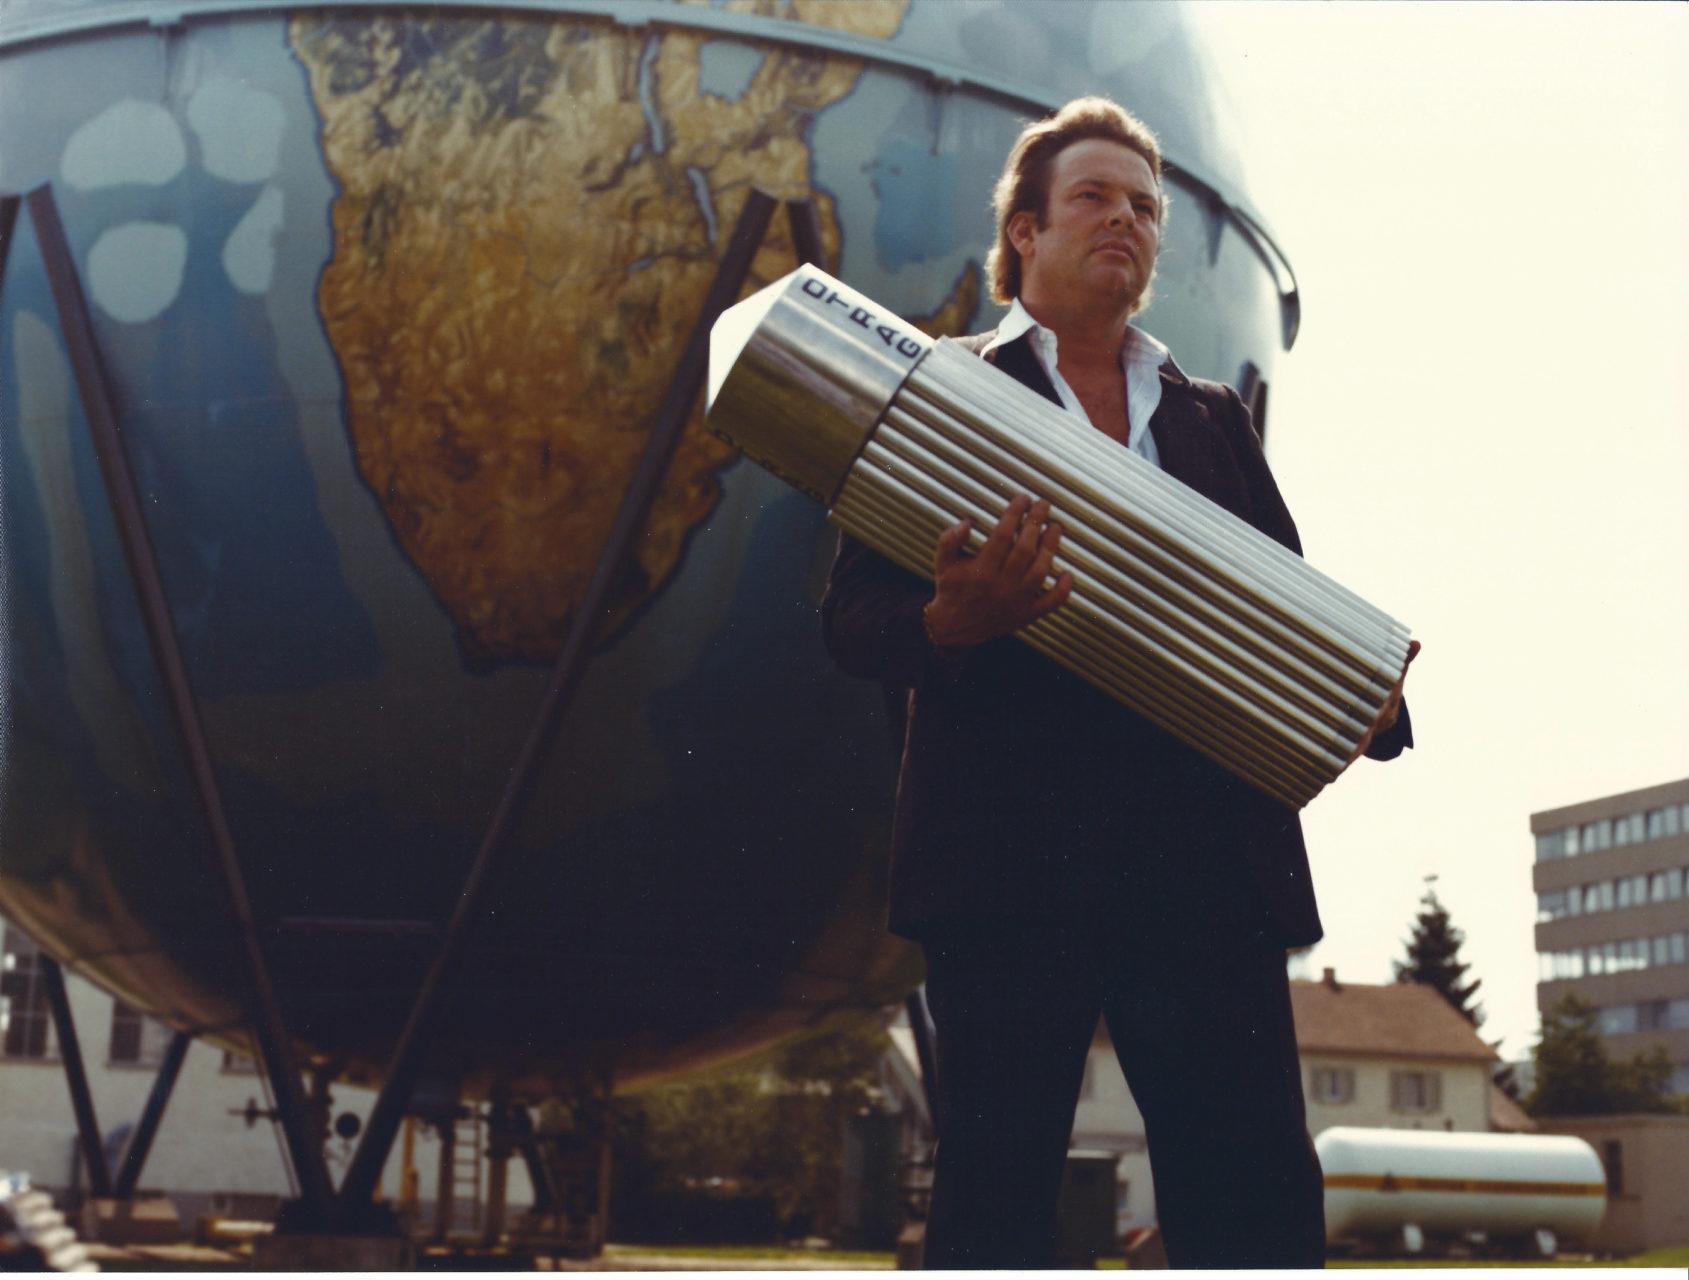 Lutz vor Erdkugel (Gastank) Stuttgart 1978-2